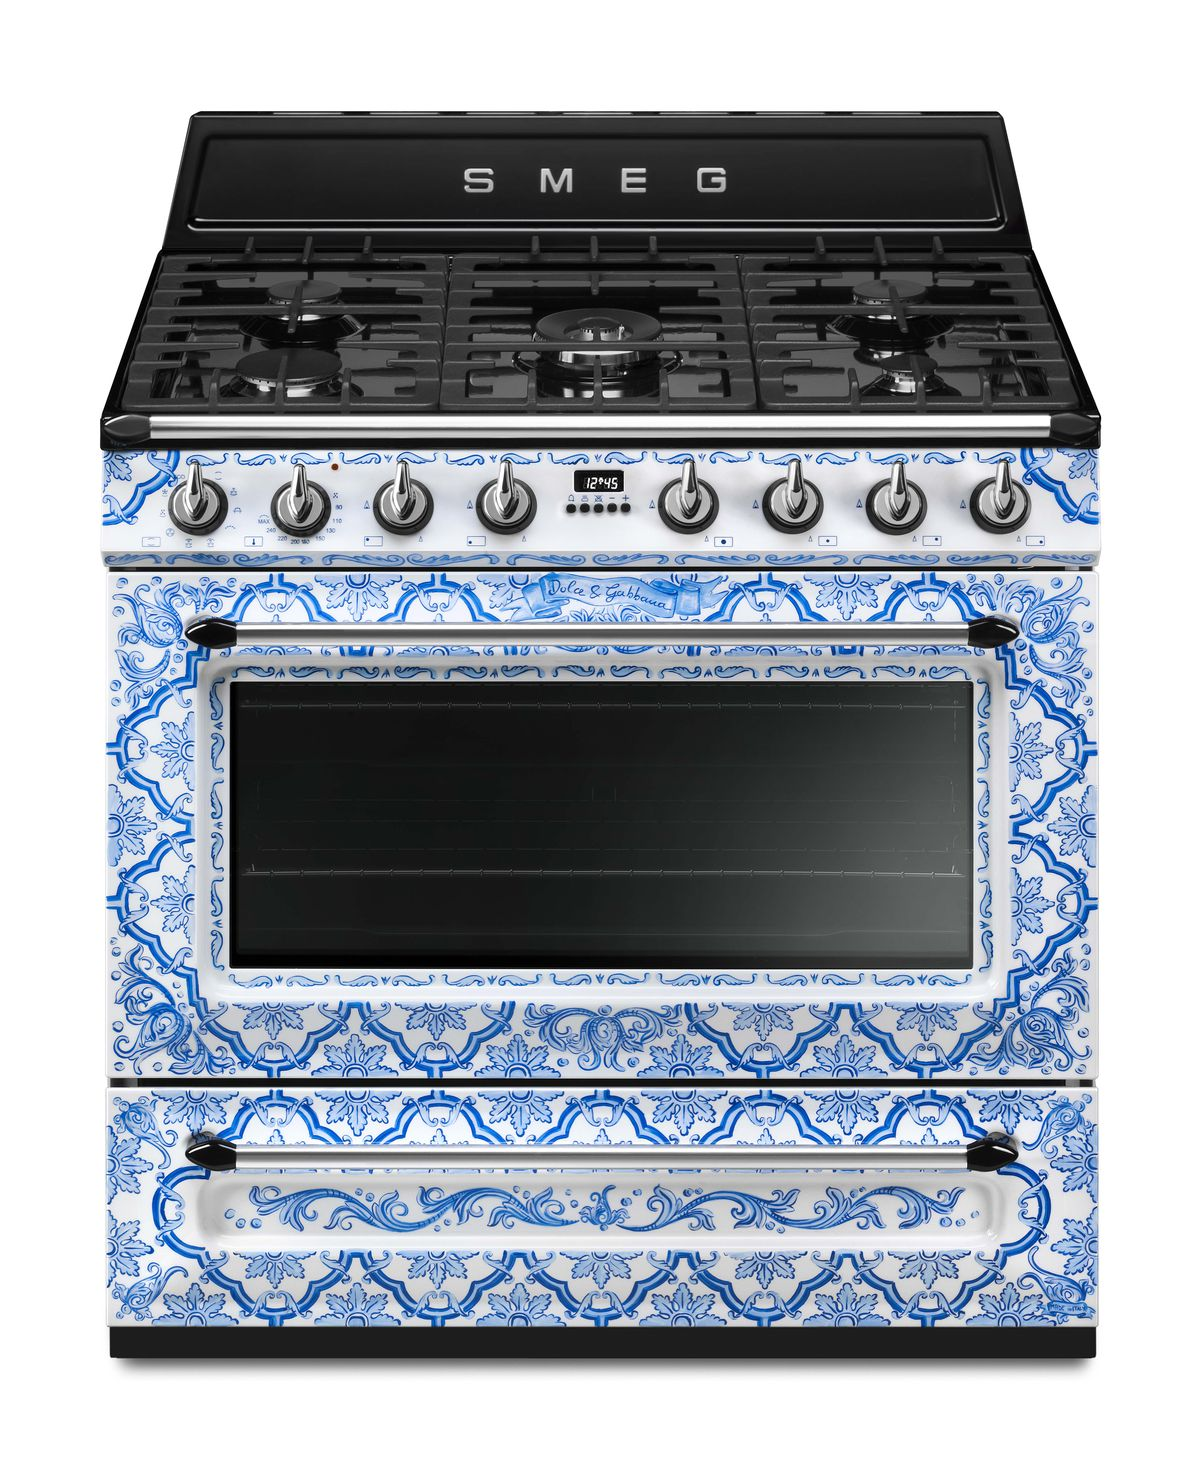 Dolce & Gabbana for Smeg kitchen appliances expands again - Curbed